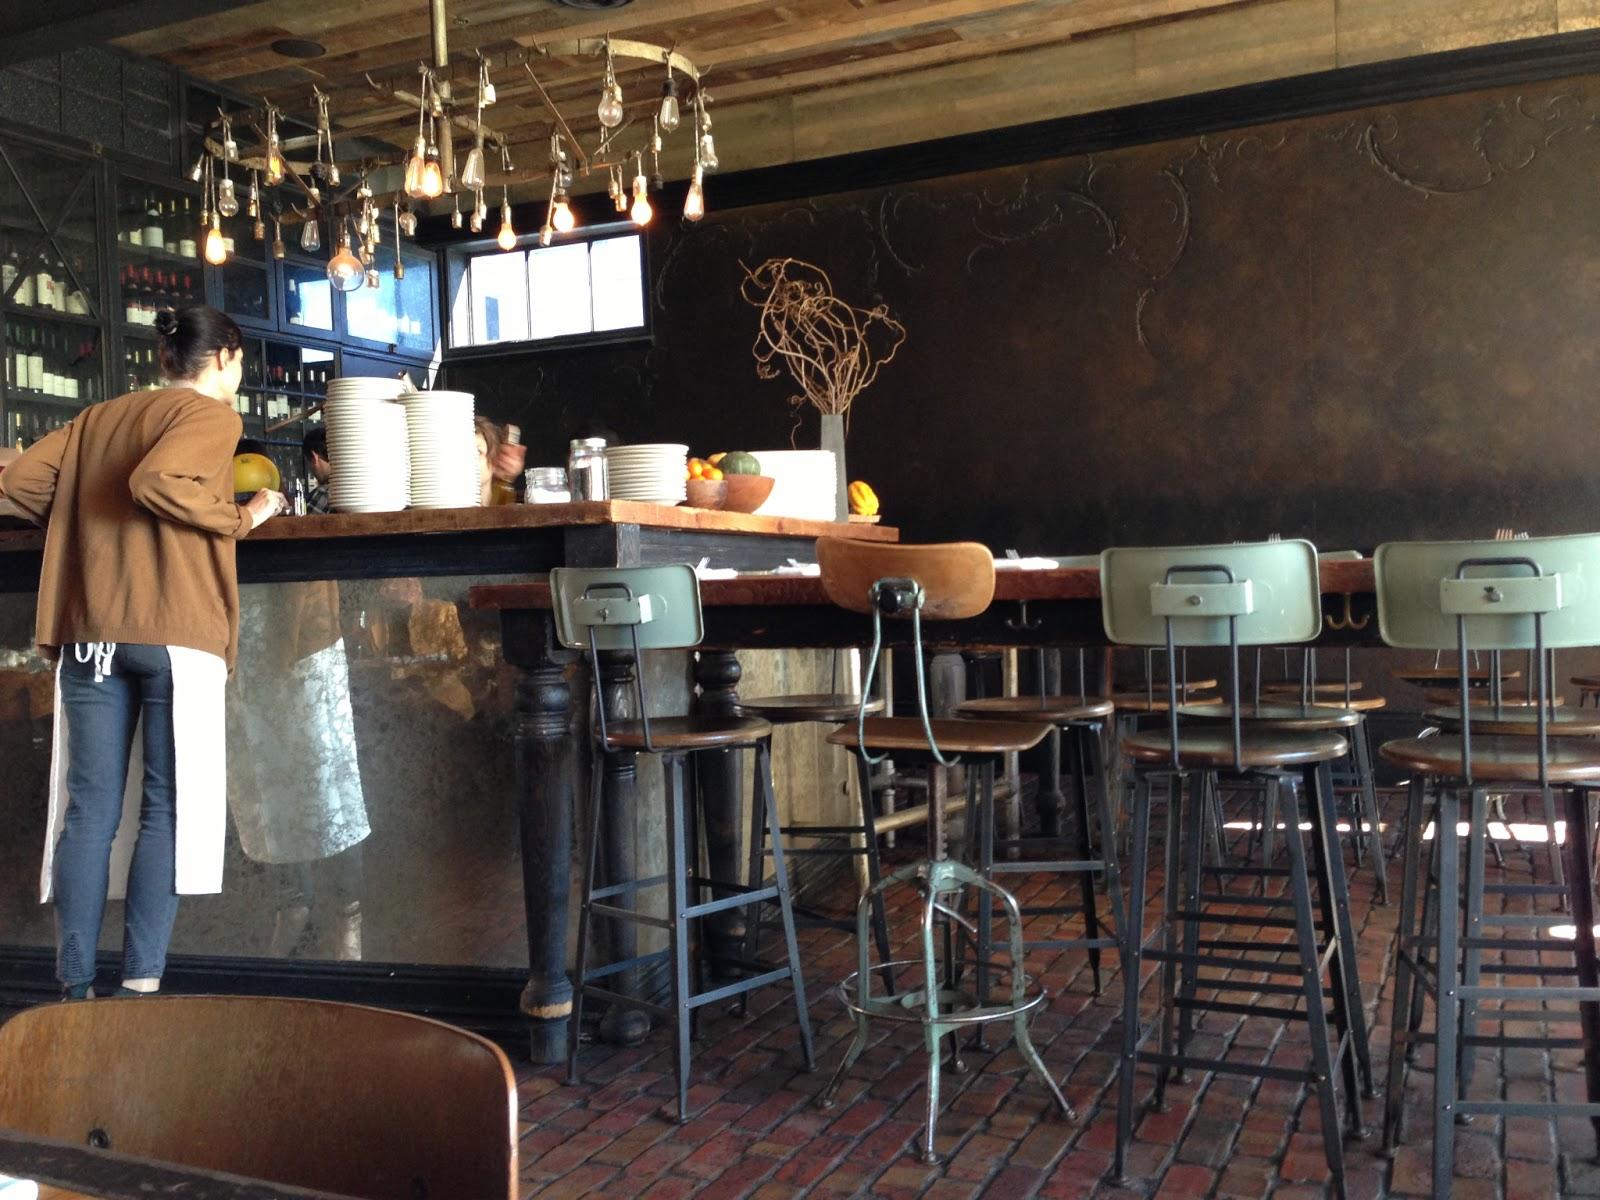 Emejing Bar And Restaurant Interior Design Ideas Gallery